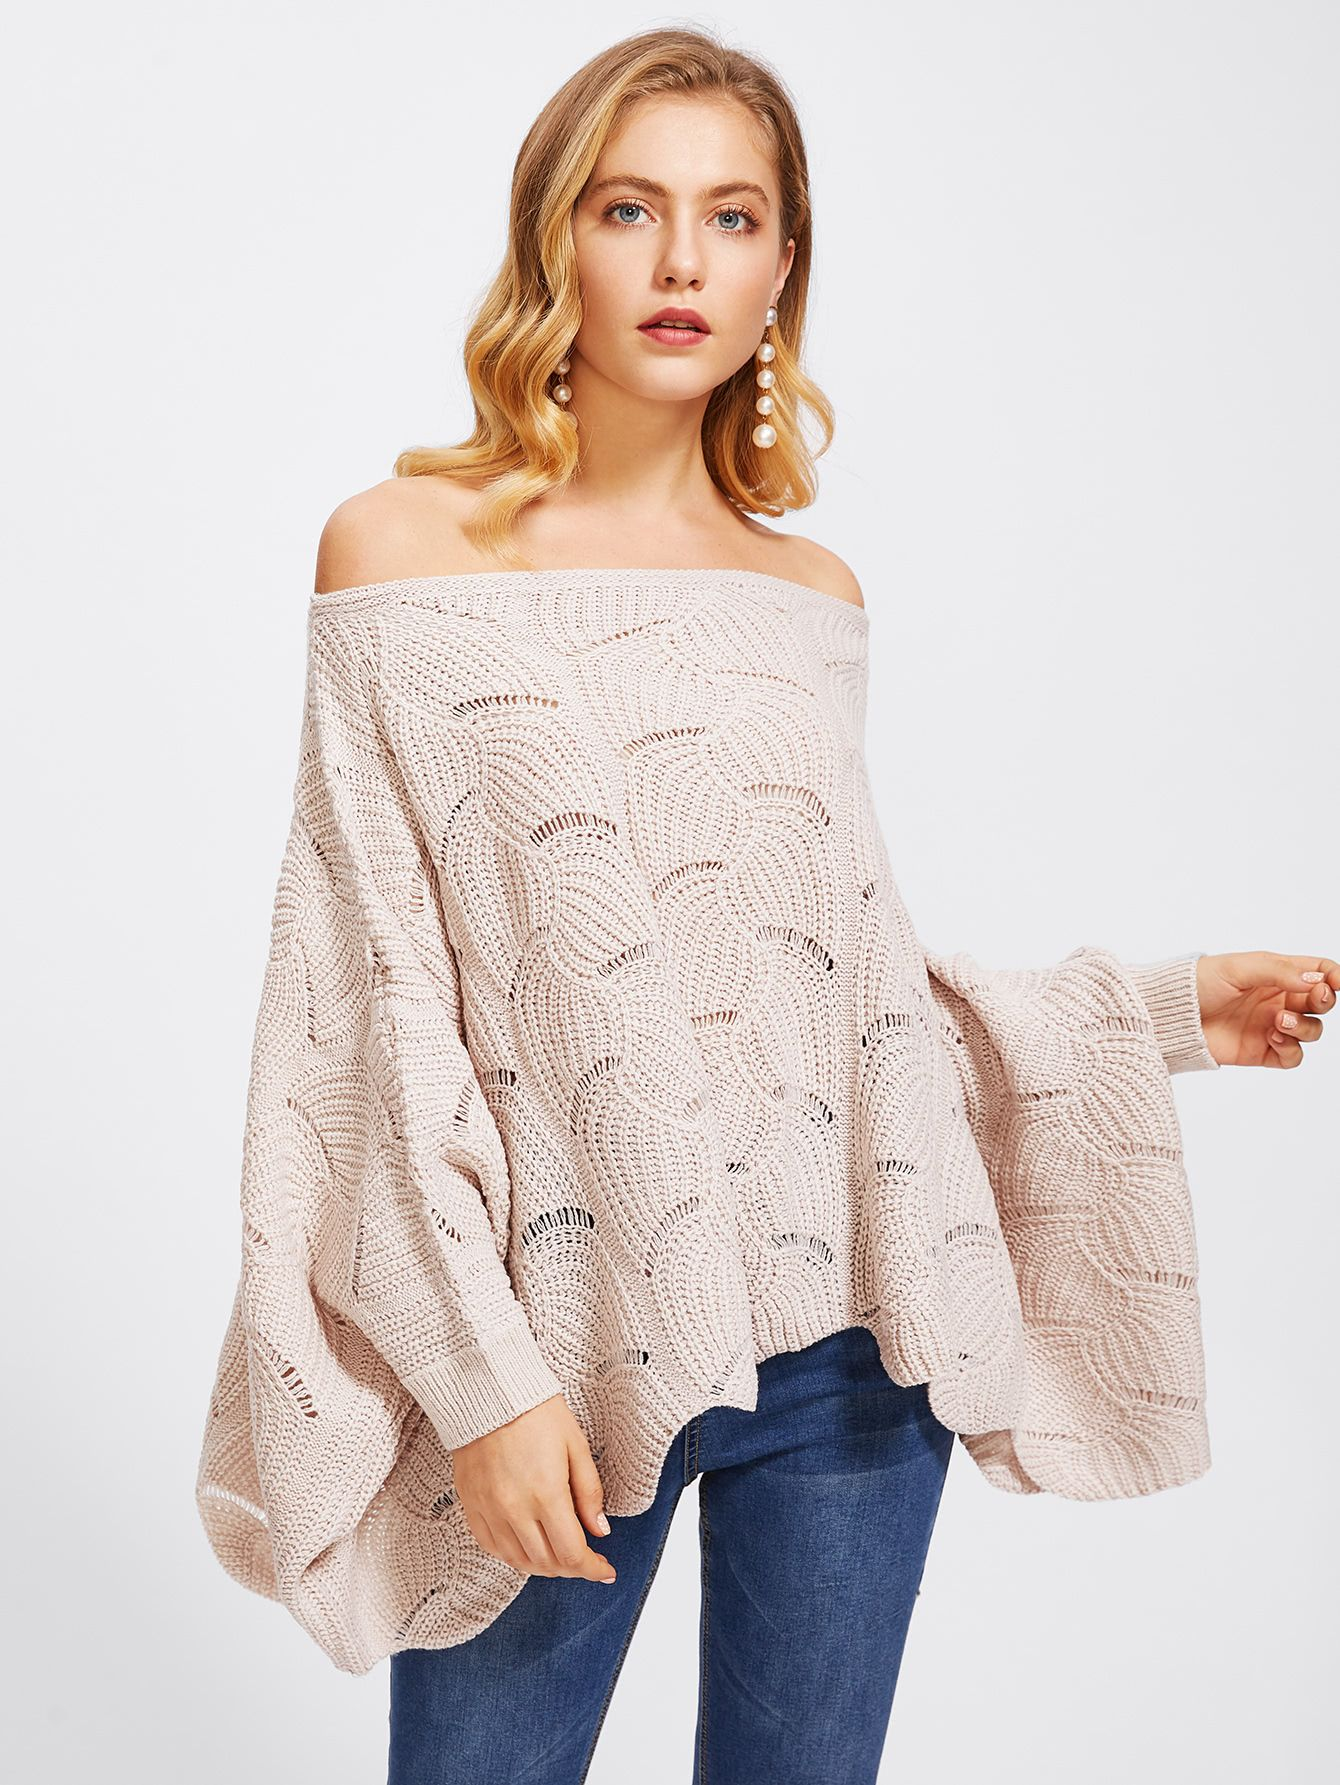 Loose Knit V-Neck Jumper - Just $6